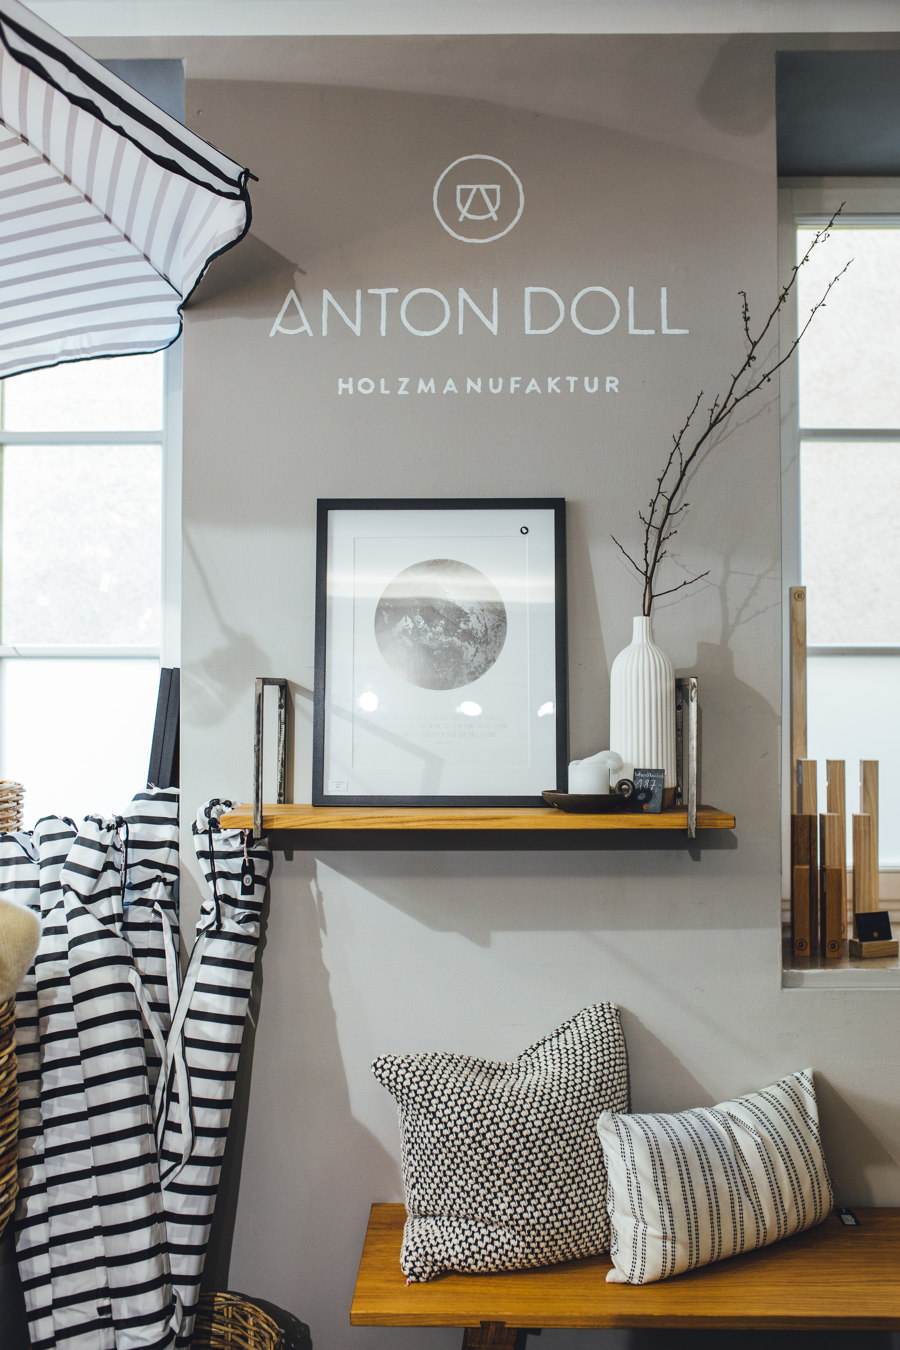 Anton Doll